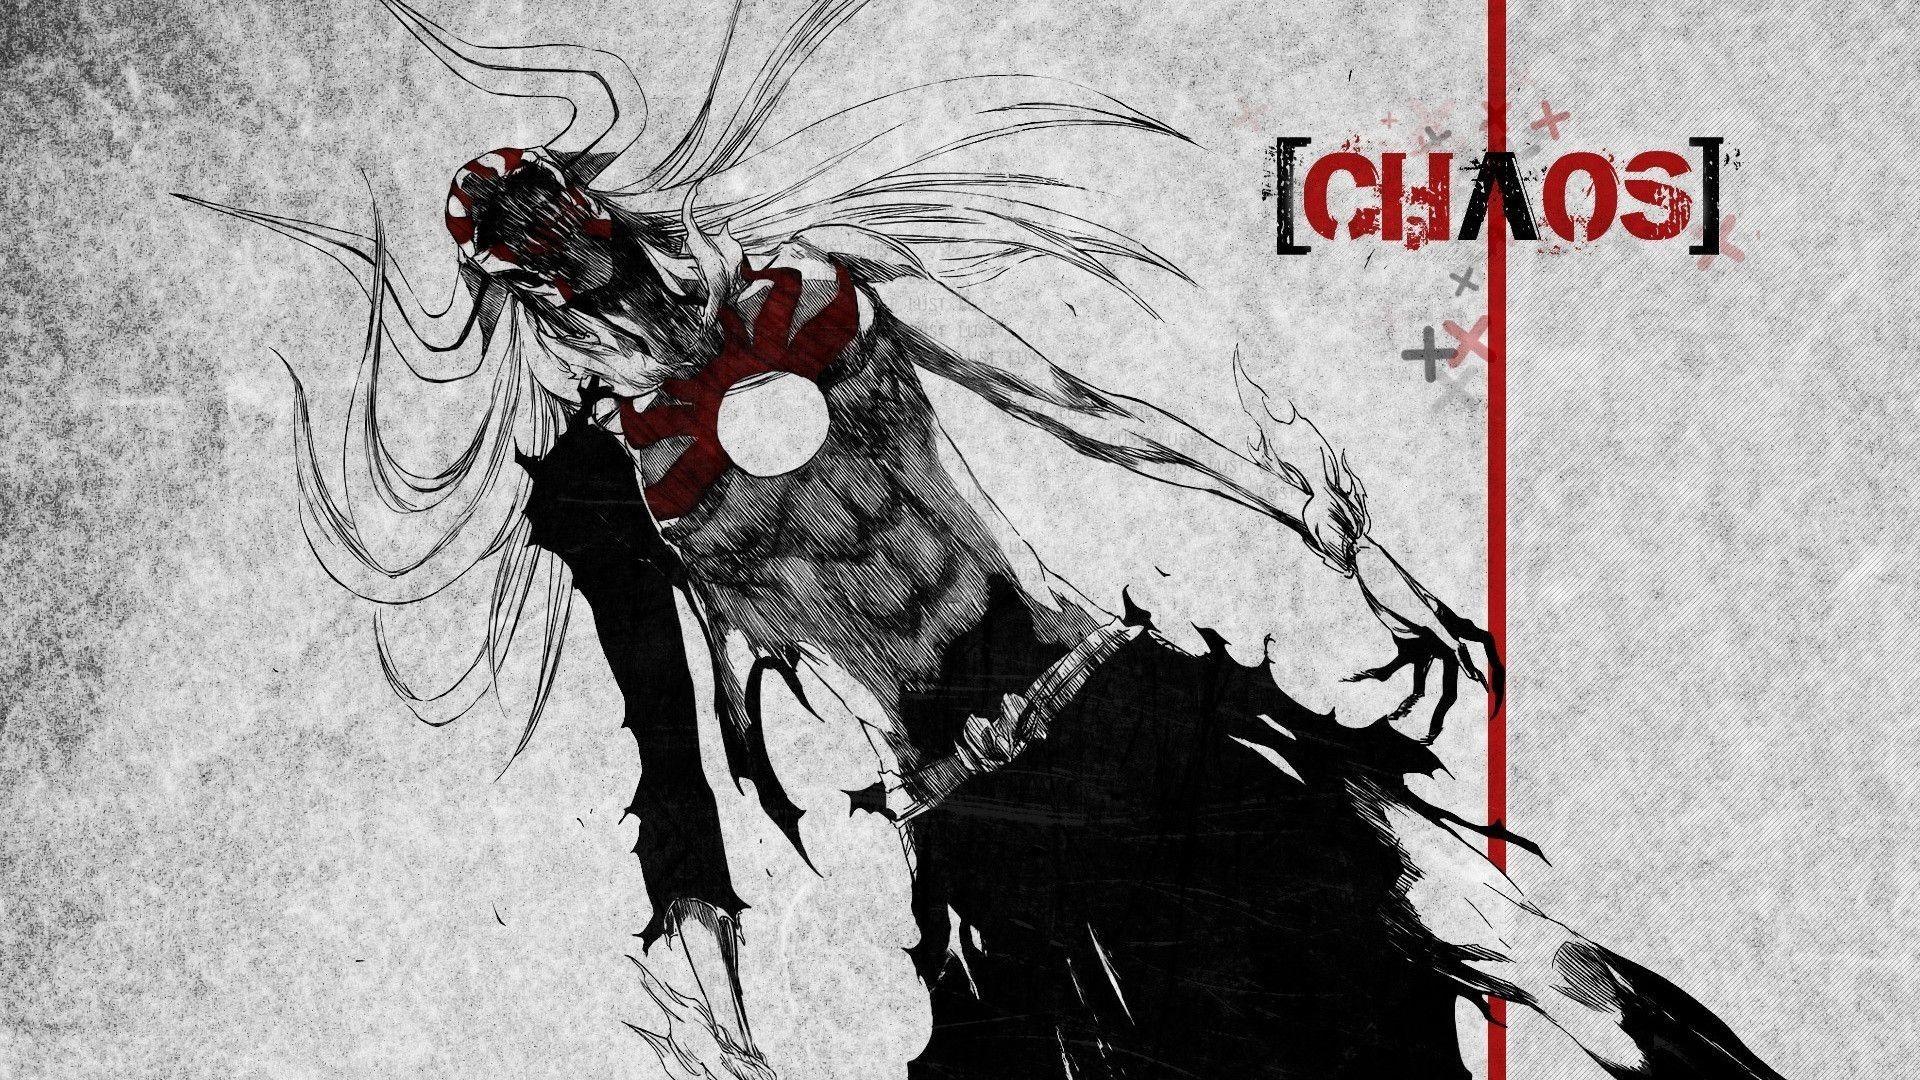 Chaos – Bleach Anime HD desktop wallpaper, Bleach wallpaper, Ichigo  wallpaper, Kurosaki wallpaper, Hollow wallpaper – Anime no.